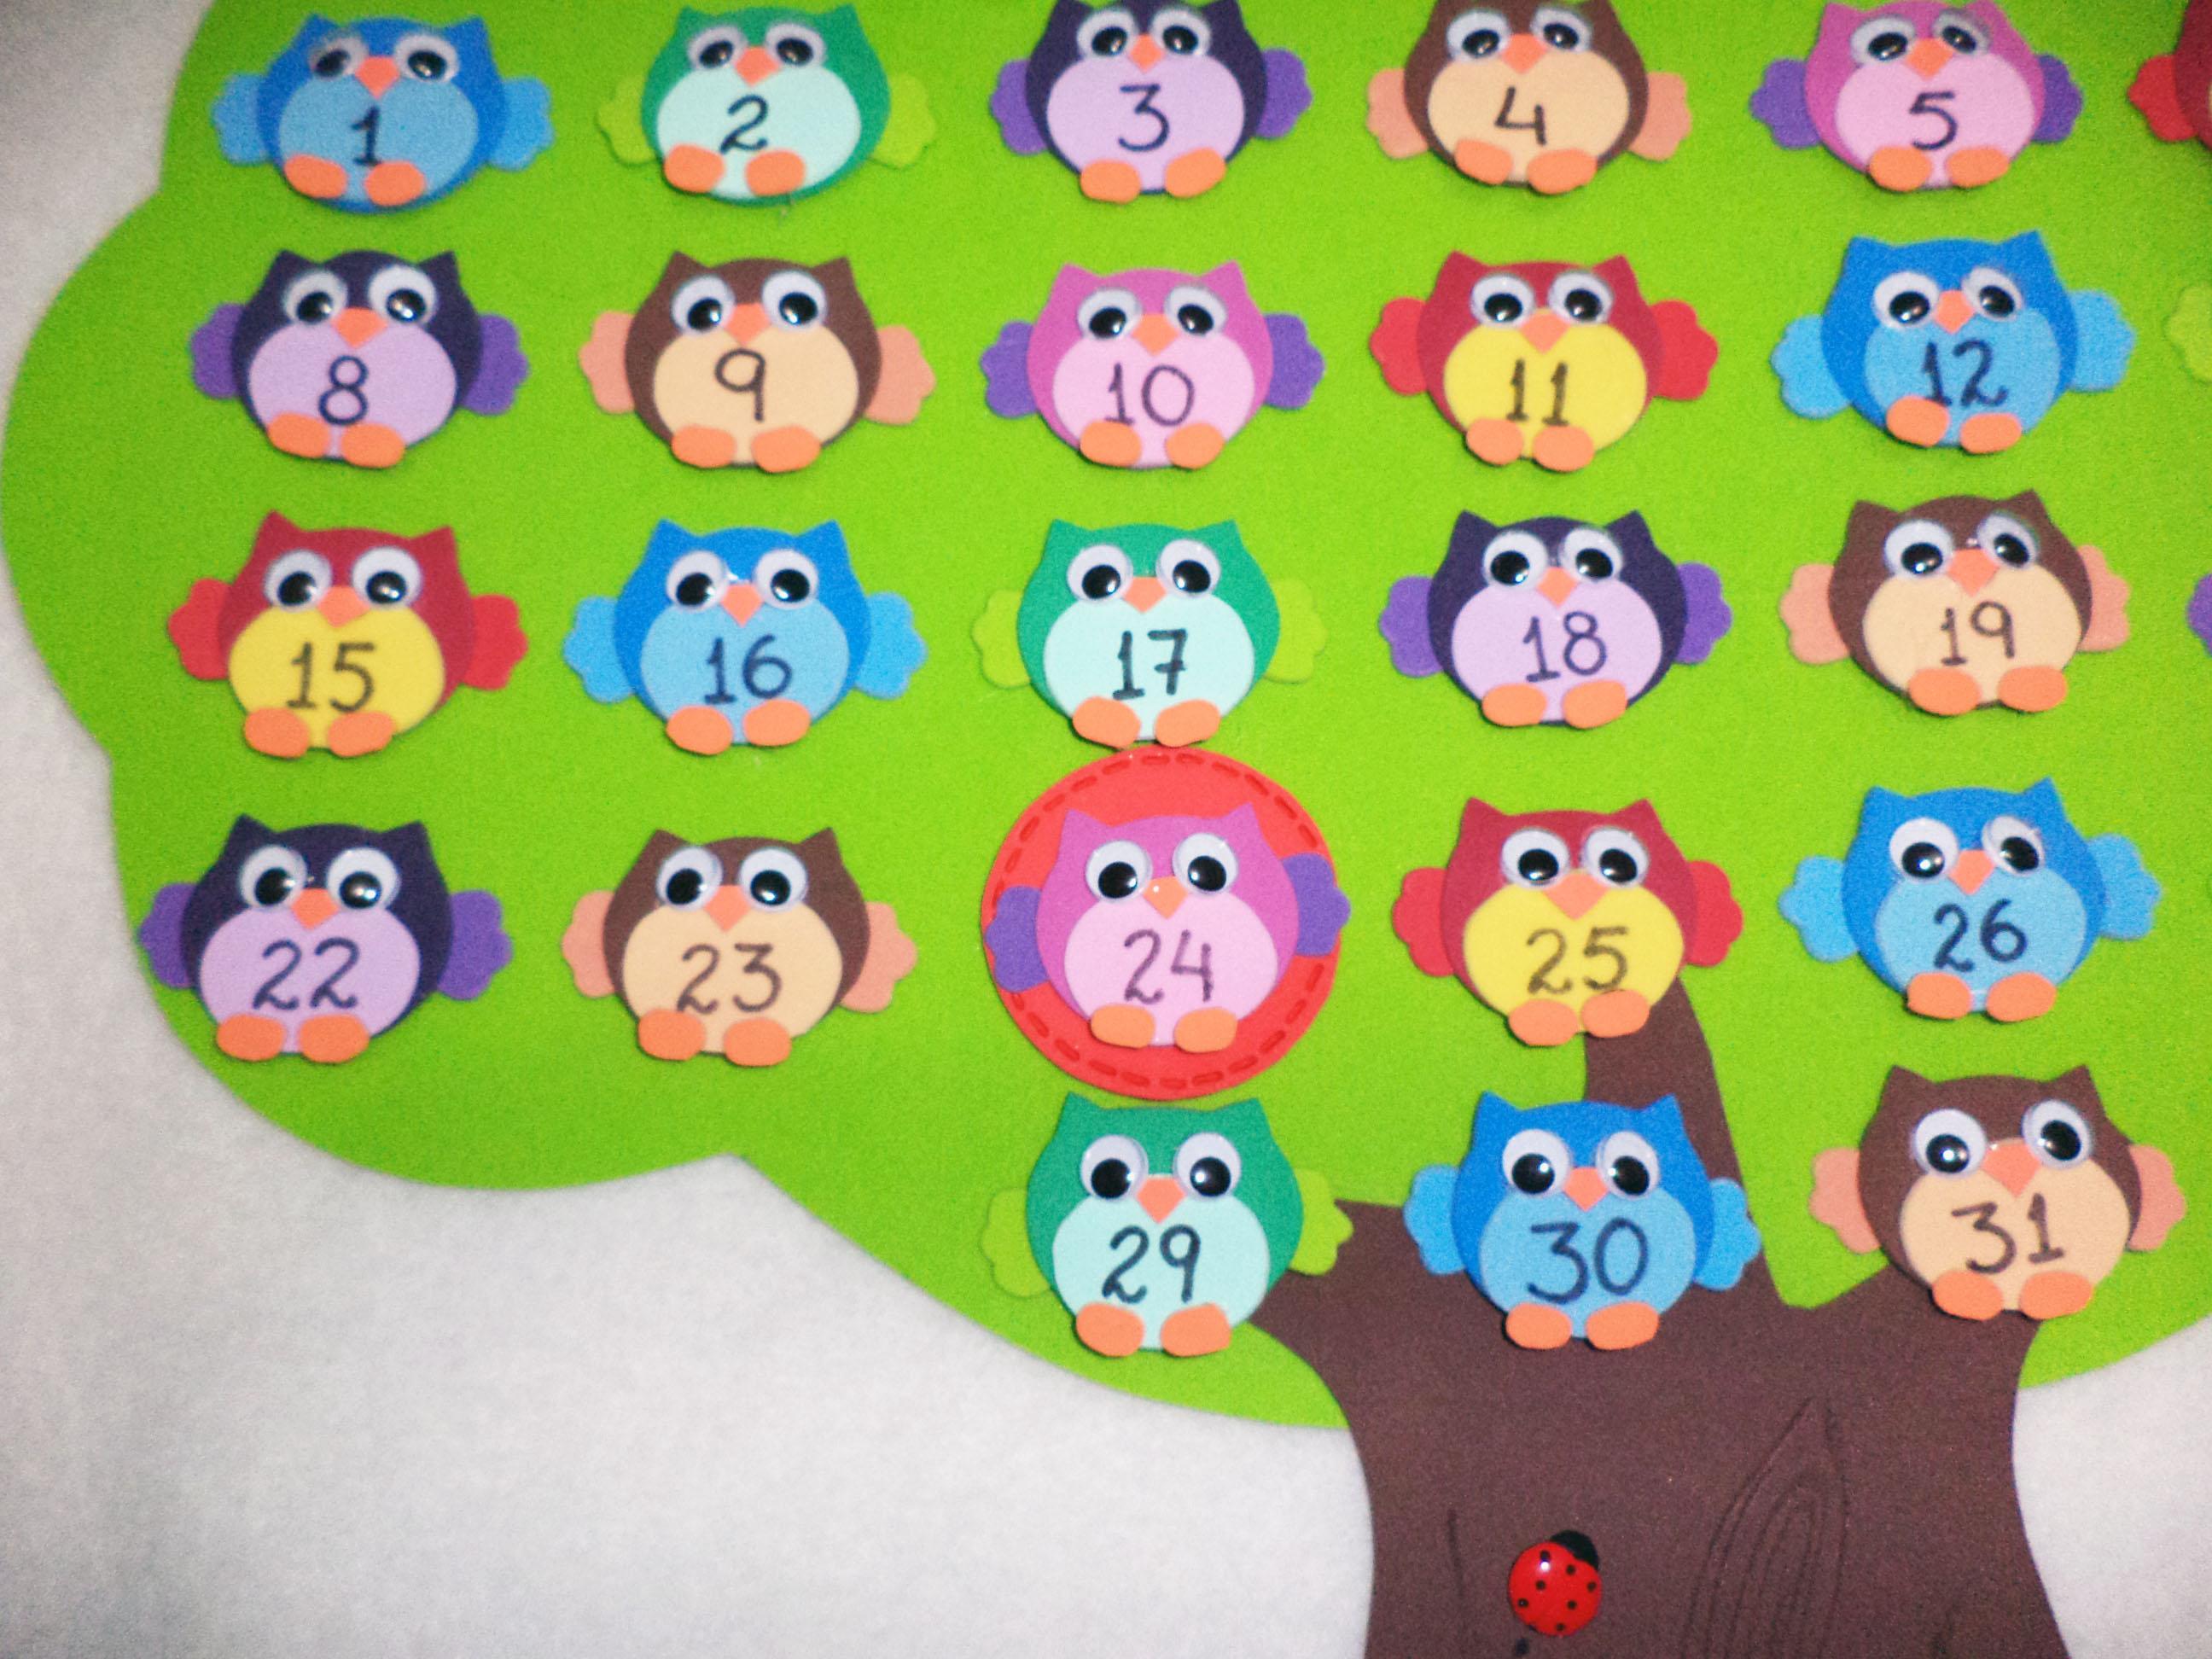 decoracao de sala aula educacao infantil : decoracao de sala aula educacao infantil:calendario-permanente-corujinhas-sala-de-aula calendario-permanente